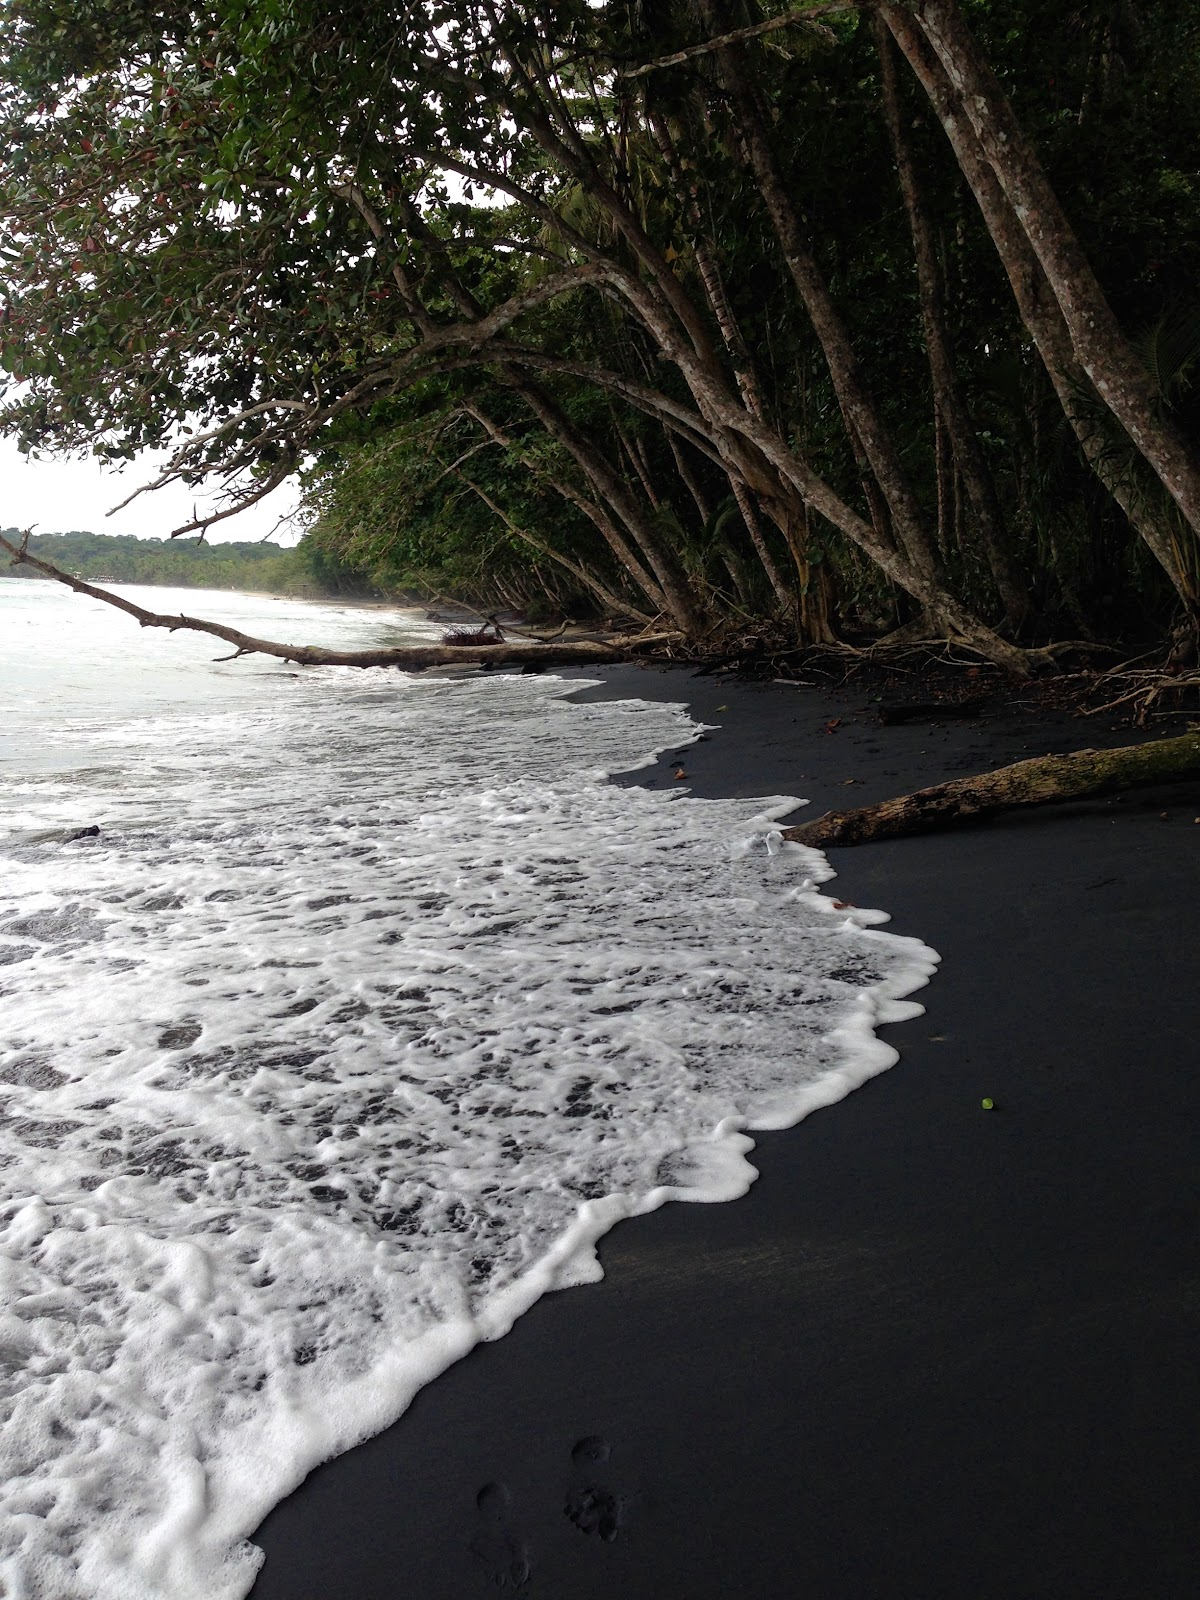 Small wave splashes the black sand coast of playa negra. black sand beach in puerto viejo de talamanca costa rica. Dark sand and mangroves near the shore.